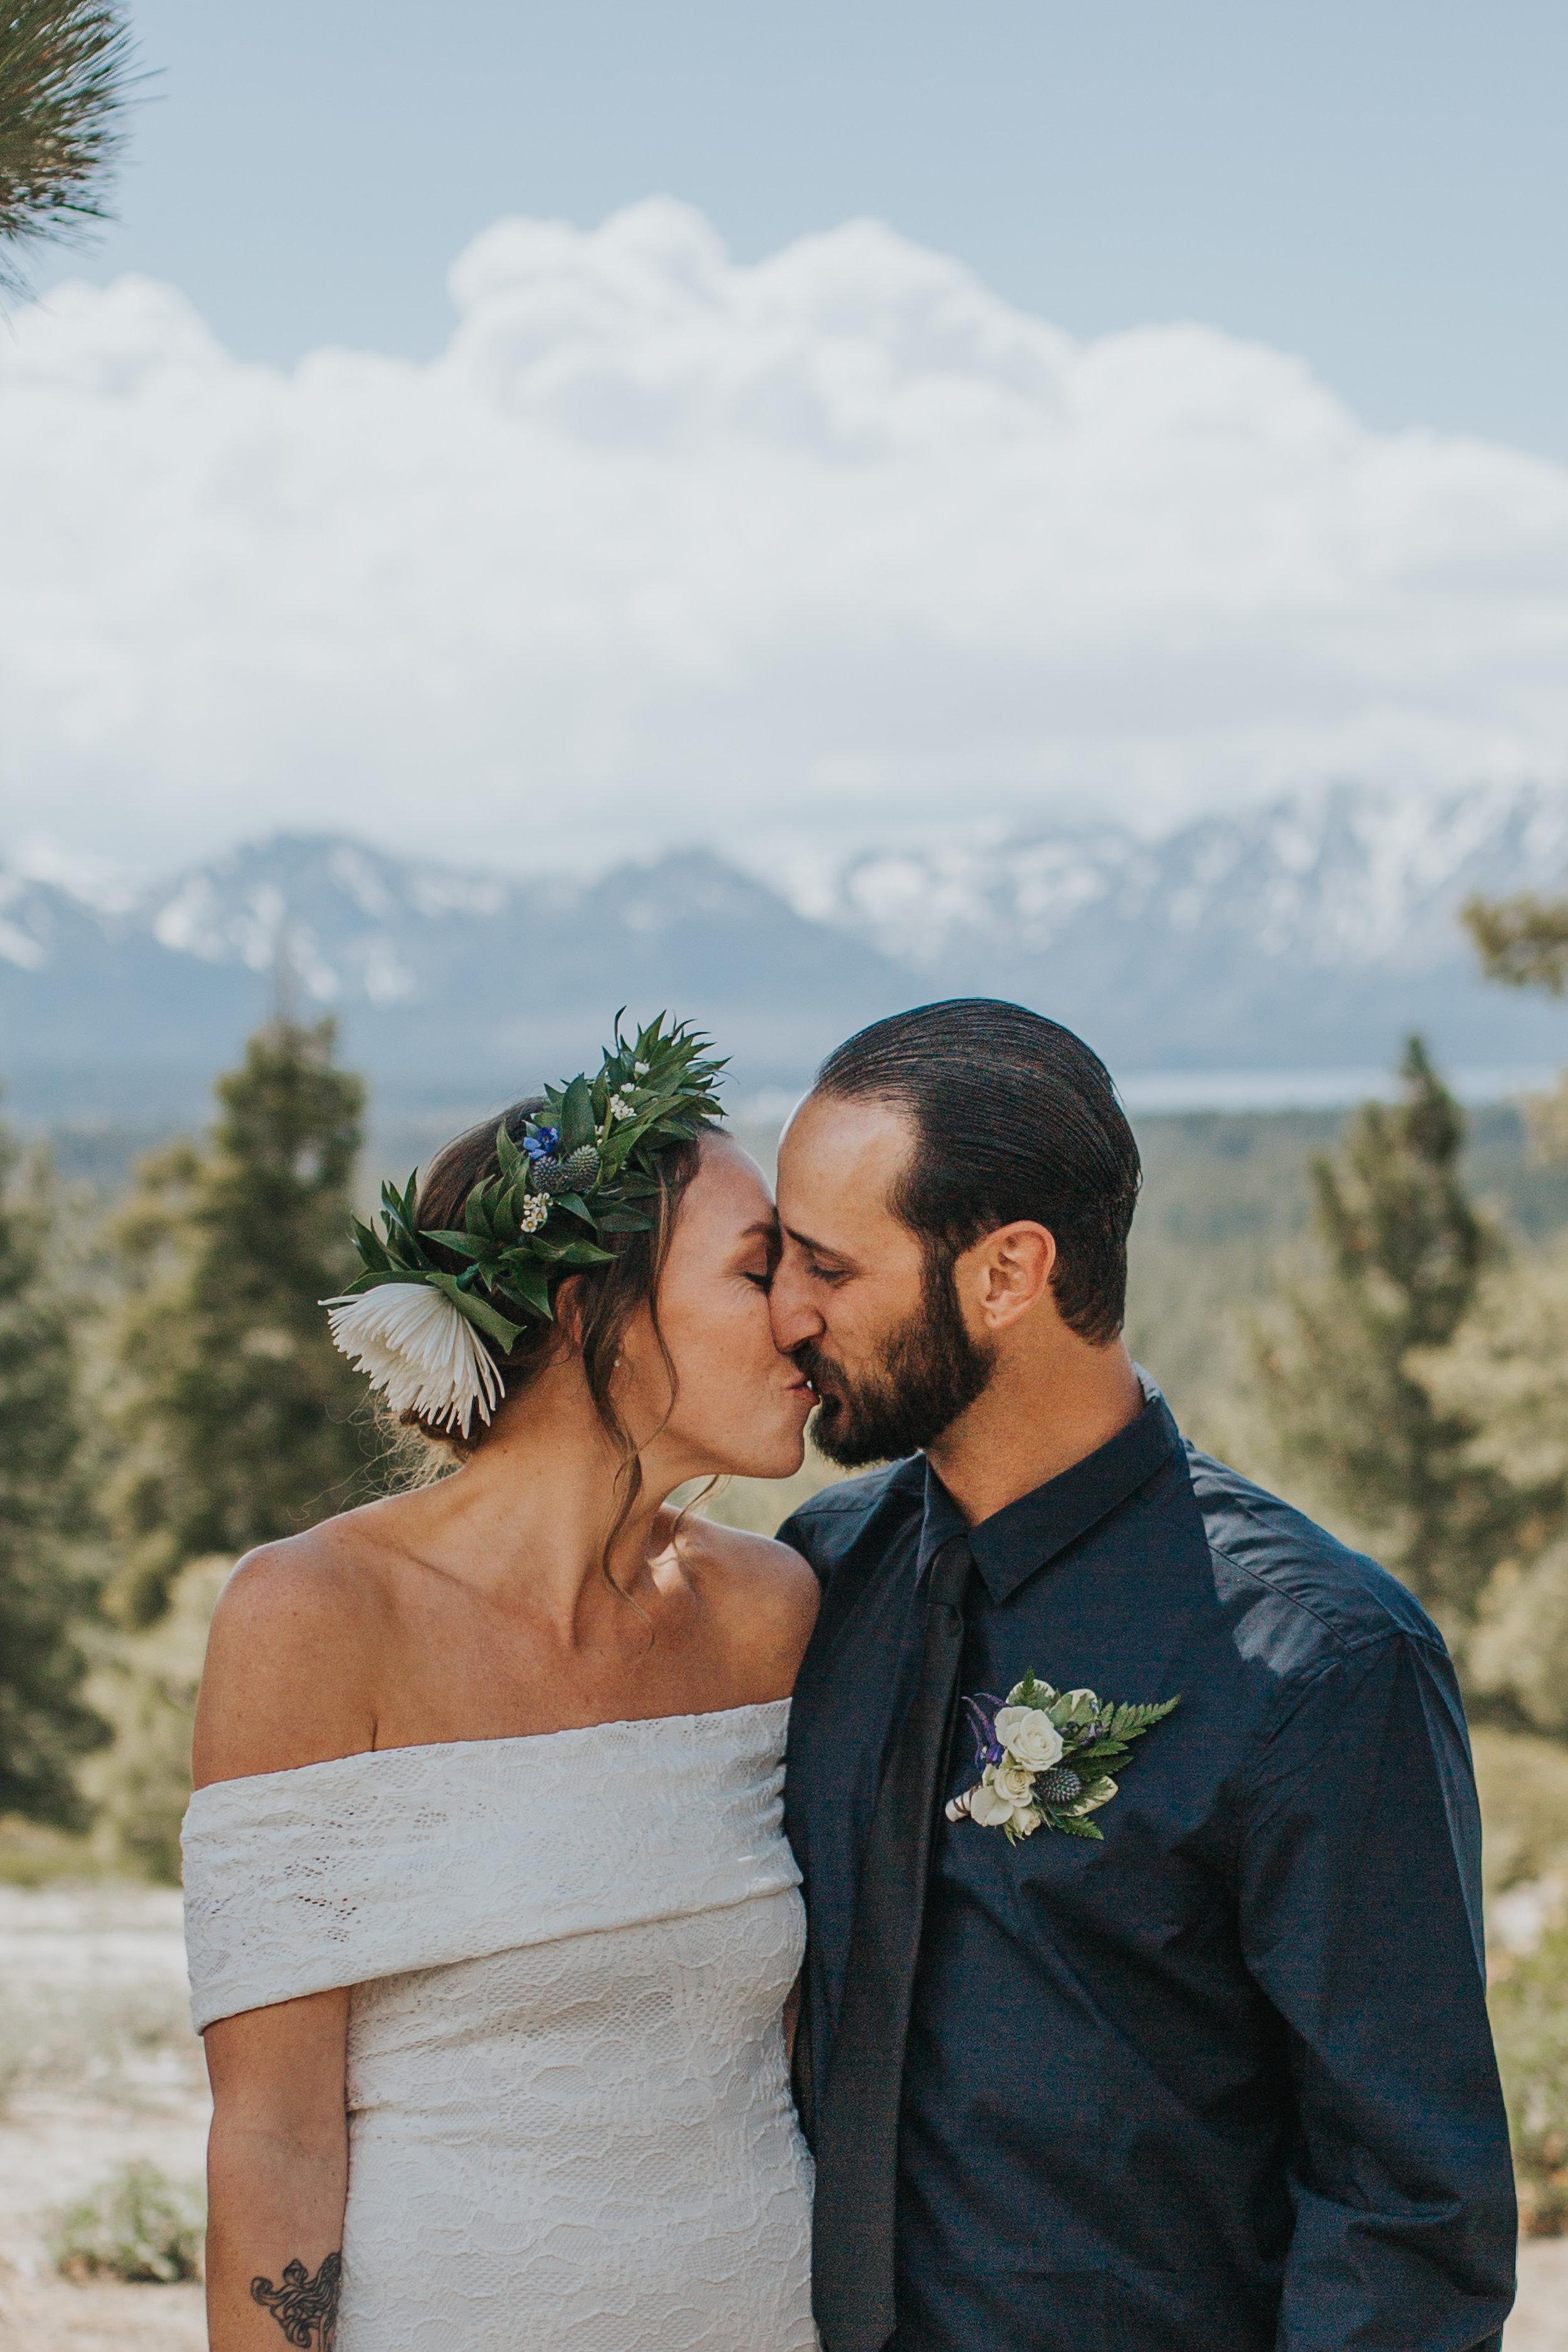 south-lake-tahoe-elopement-valerie-lendvay-photo-033.jpg